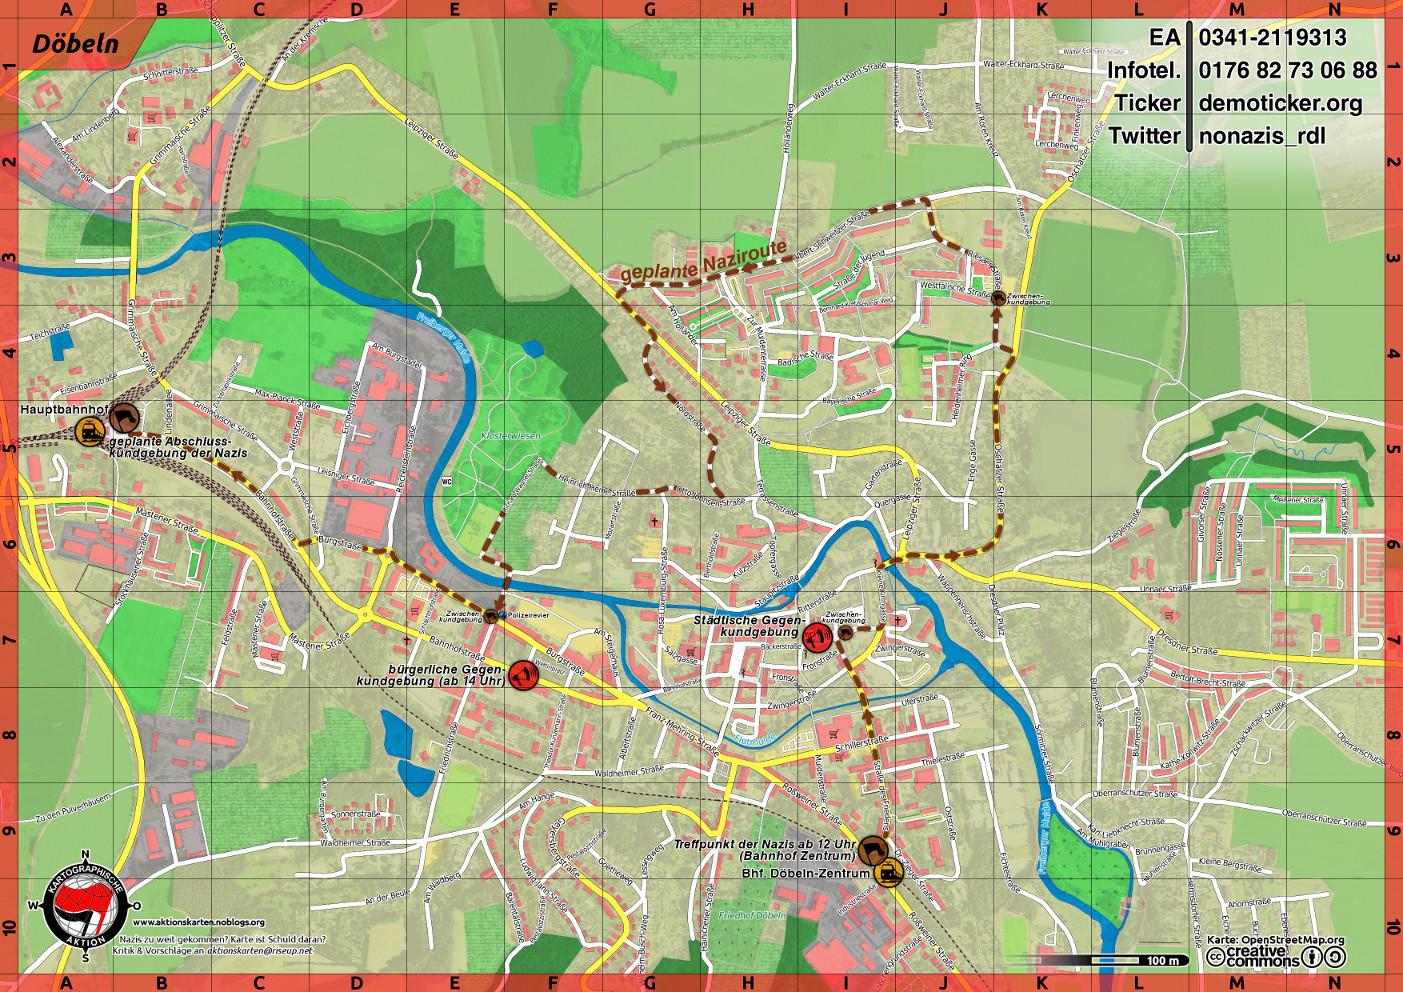 Aktionskarte_04.10.14